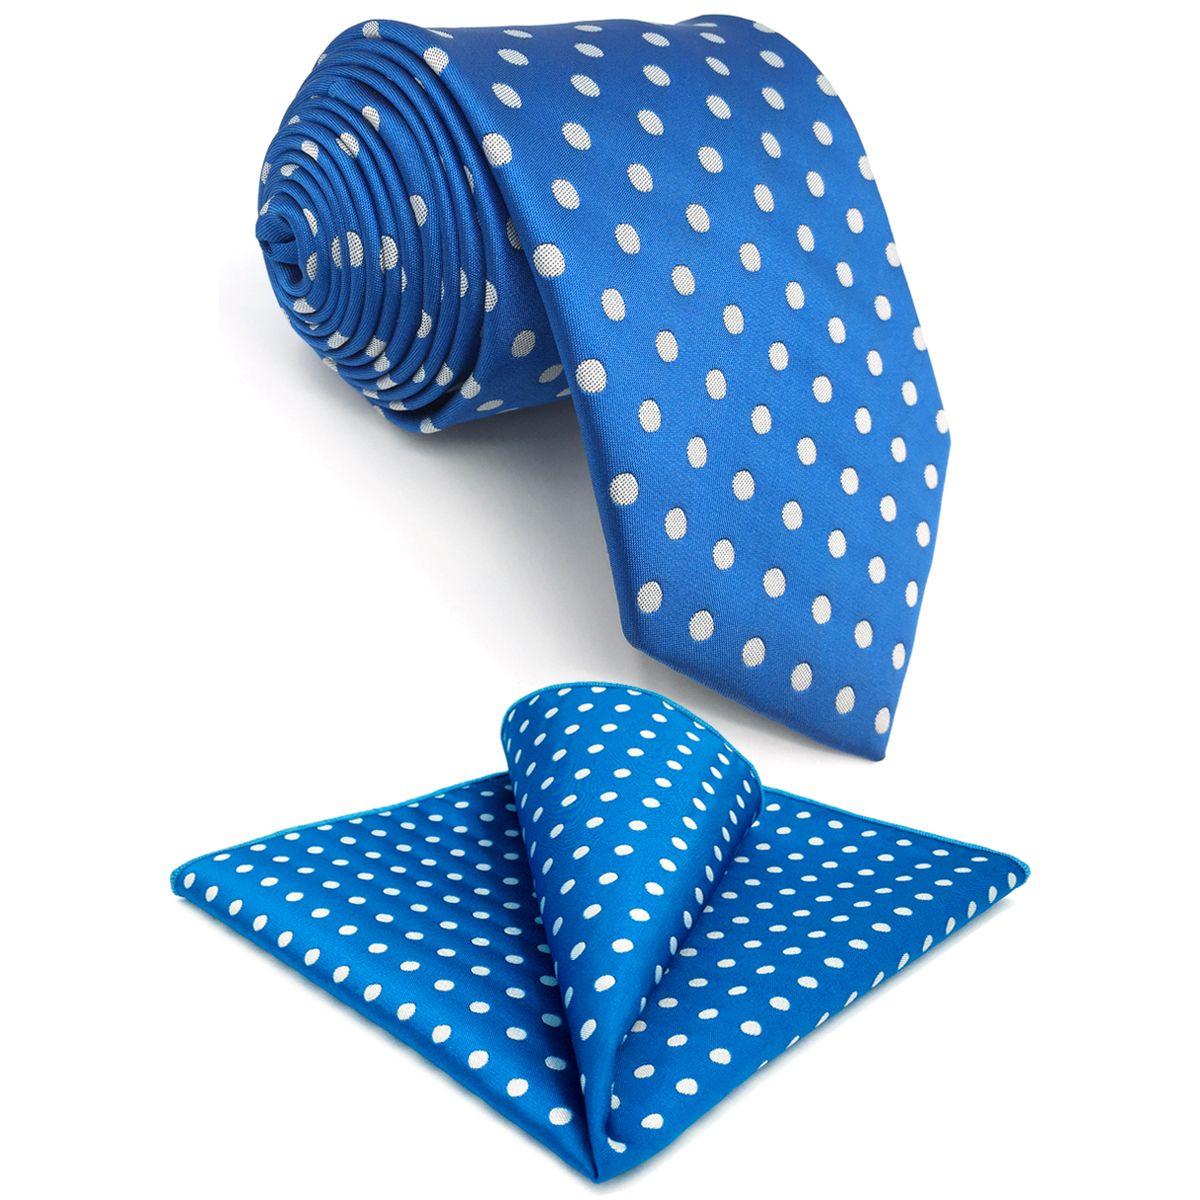 Elegant Neckties for Men Boys Skinny Novelty Paisley Necktie Party Tie